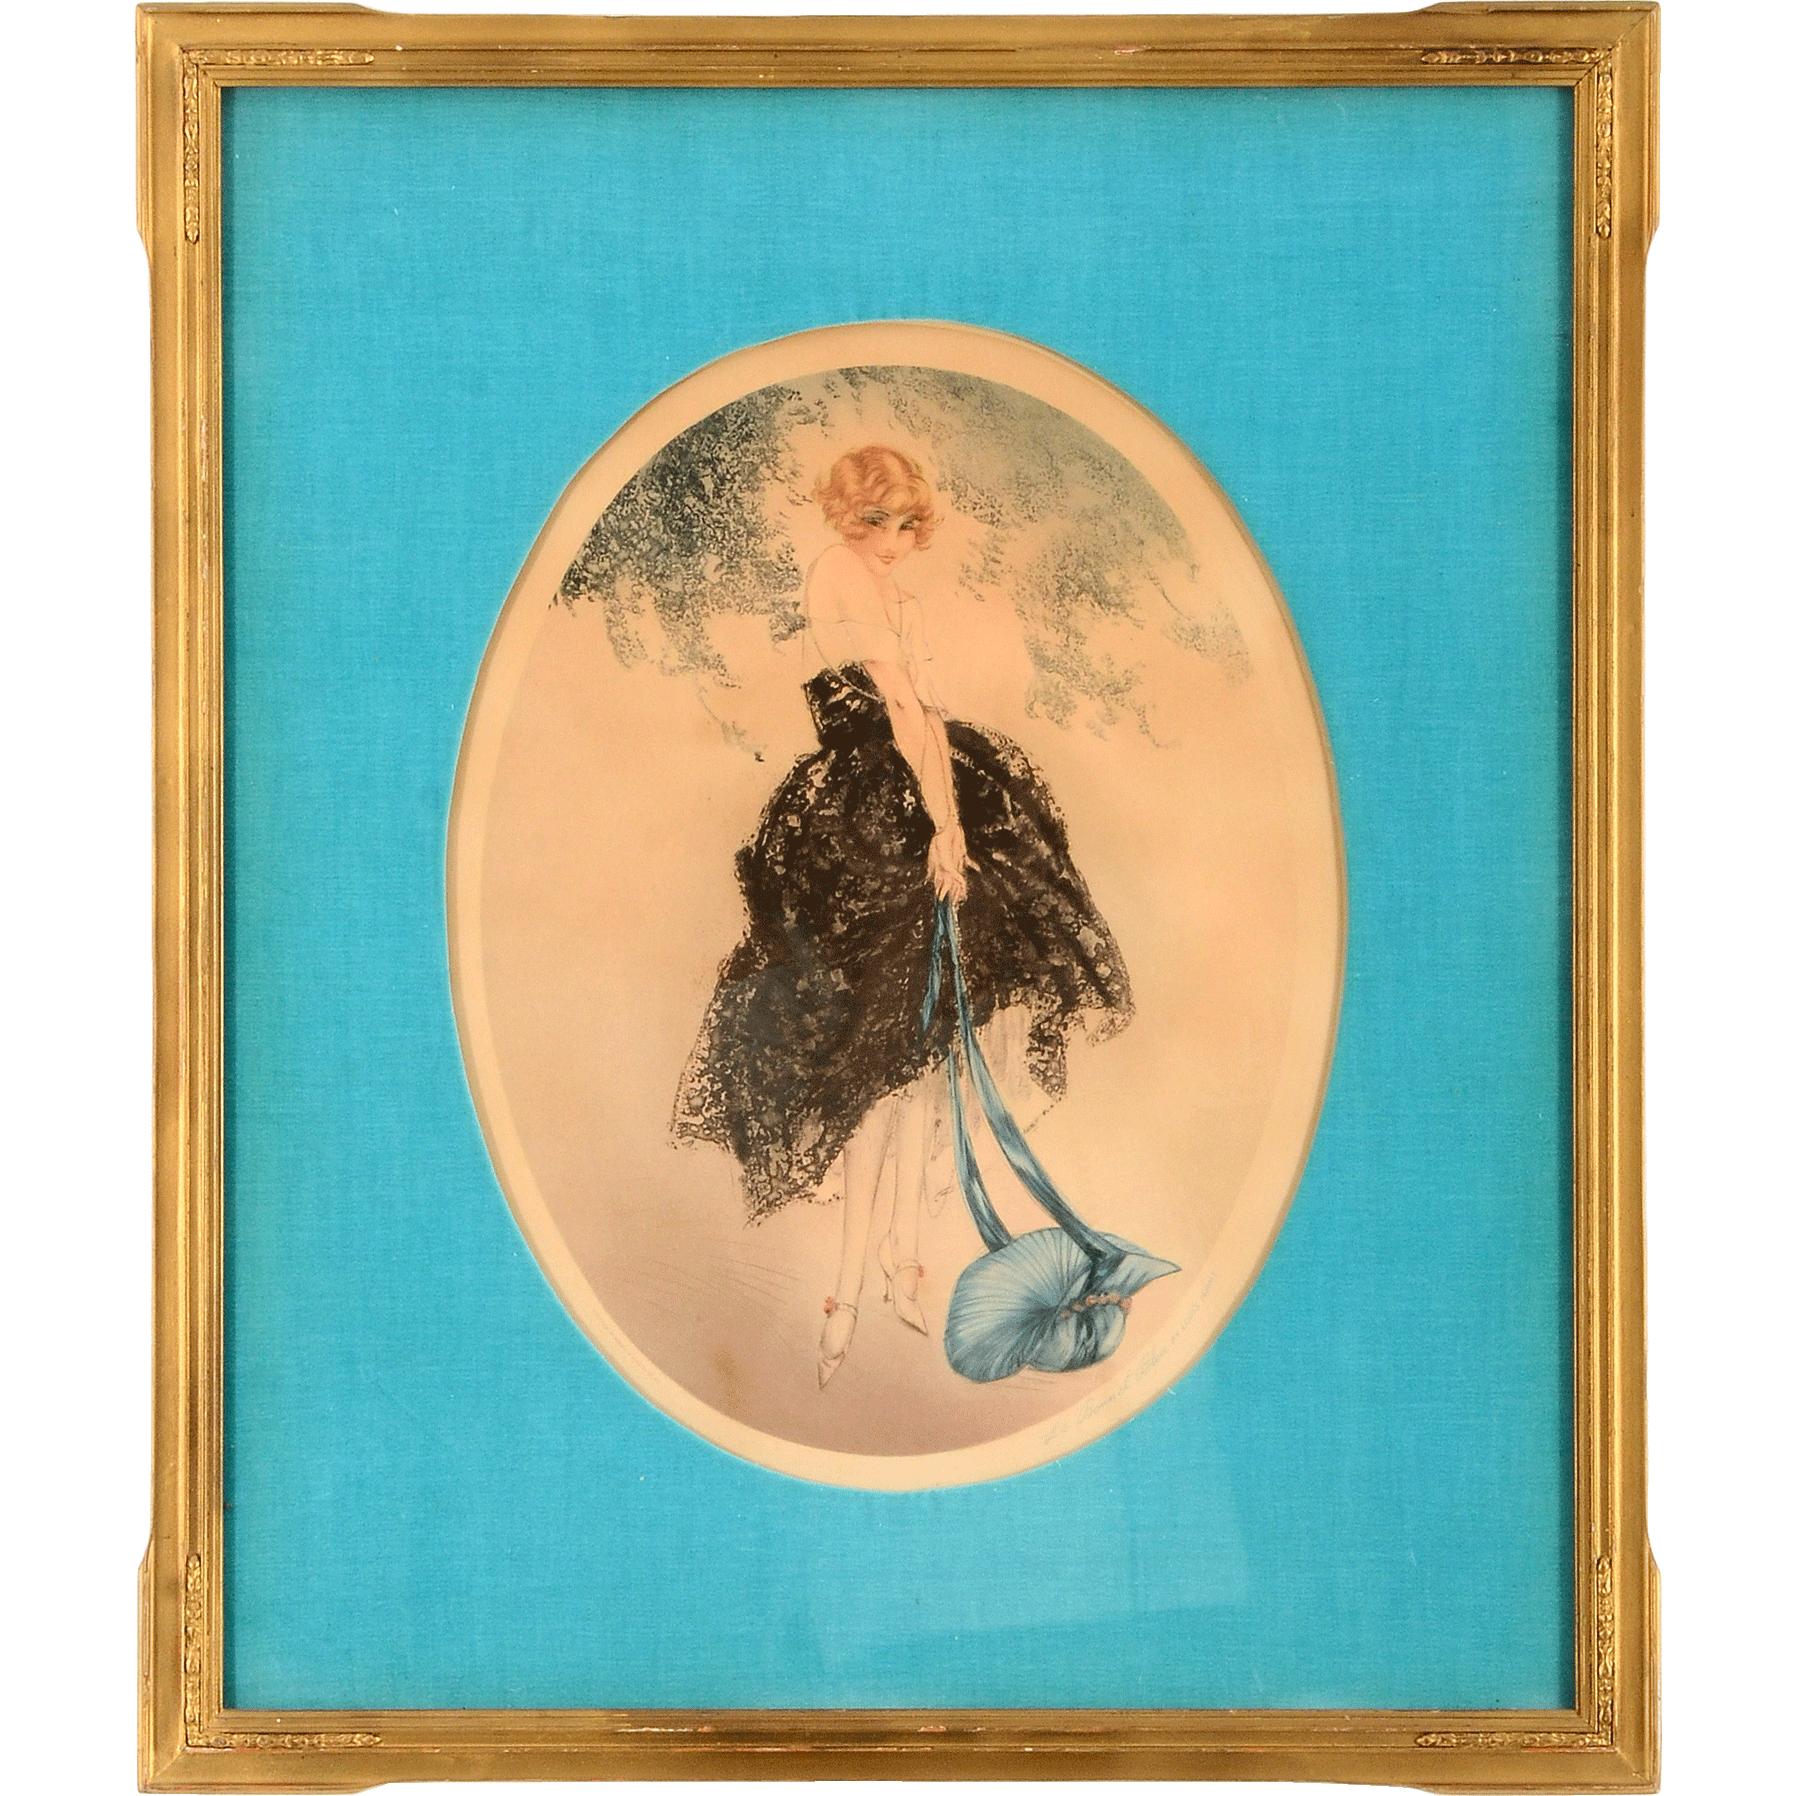 French Copy of Louis Icart Print Le Bonnet Bleu